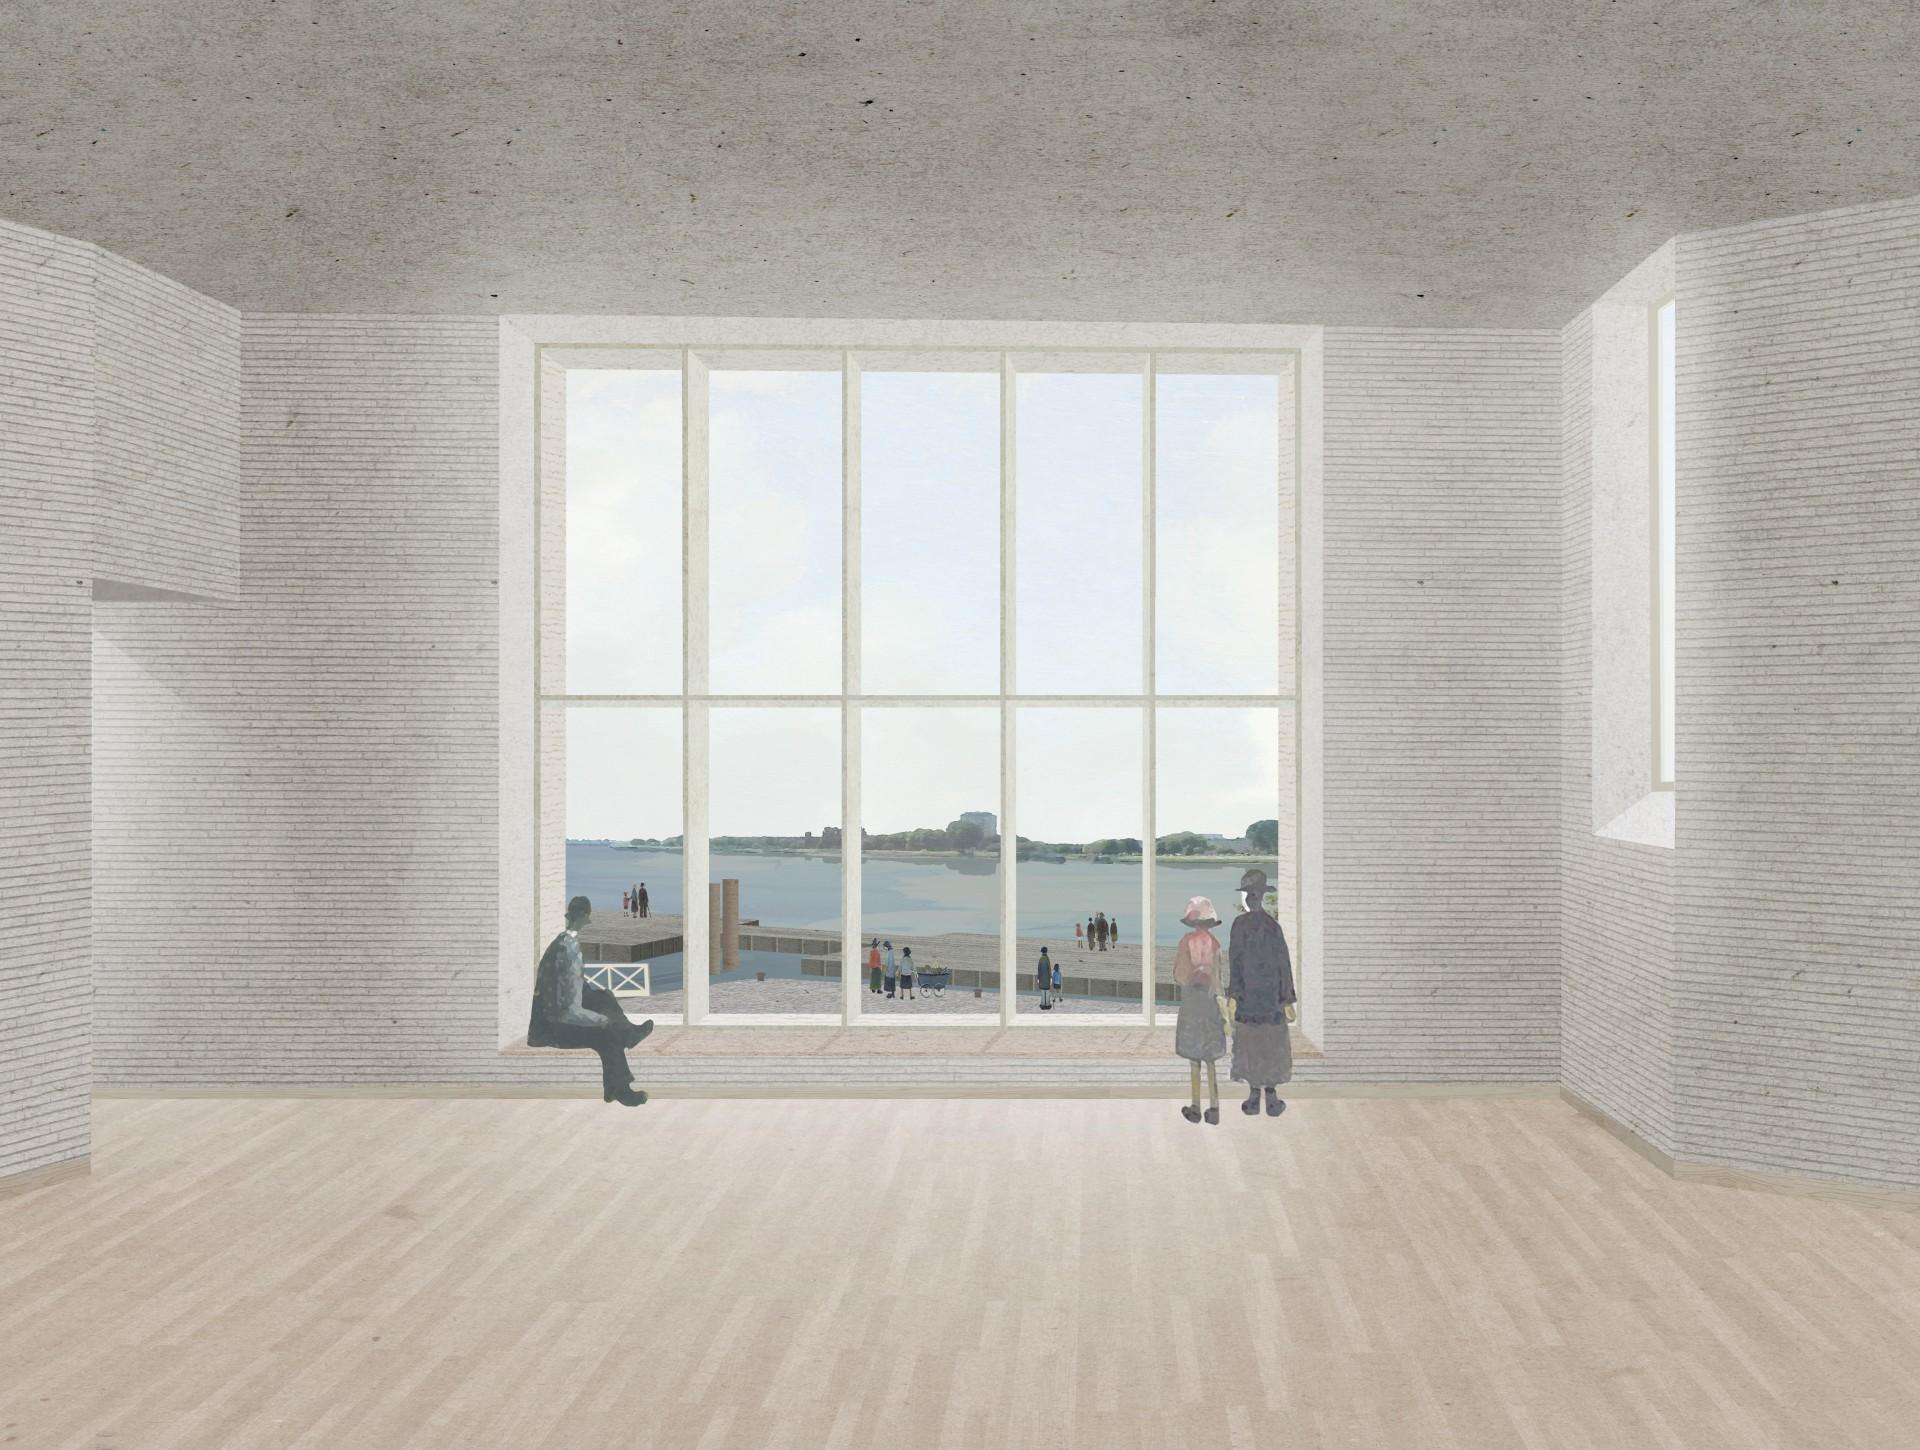 Steen In Interieur : Ag vespa schipperskwartier en centrum